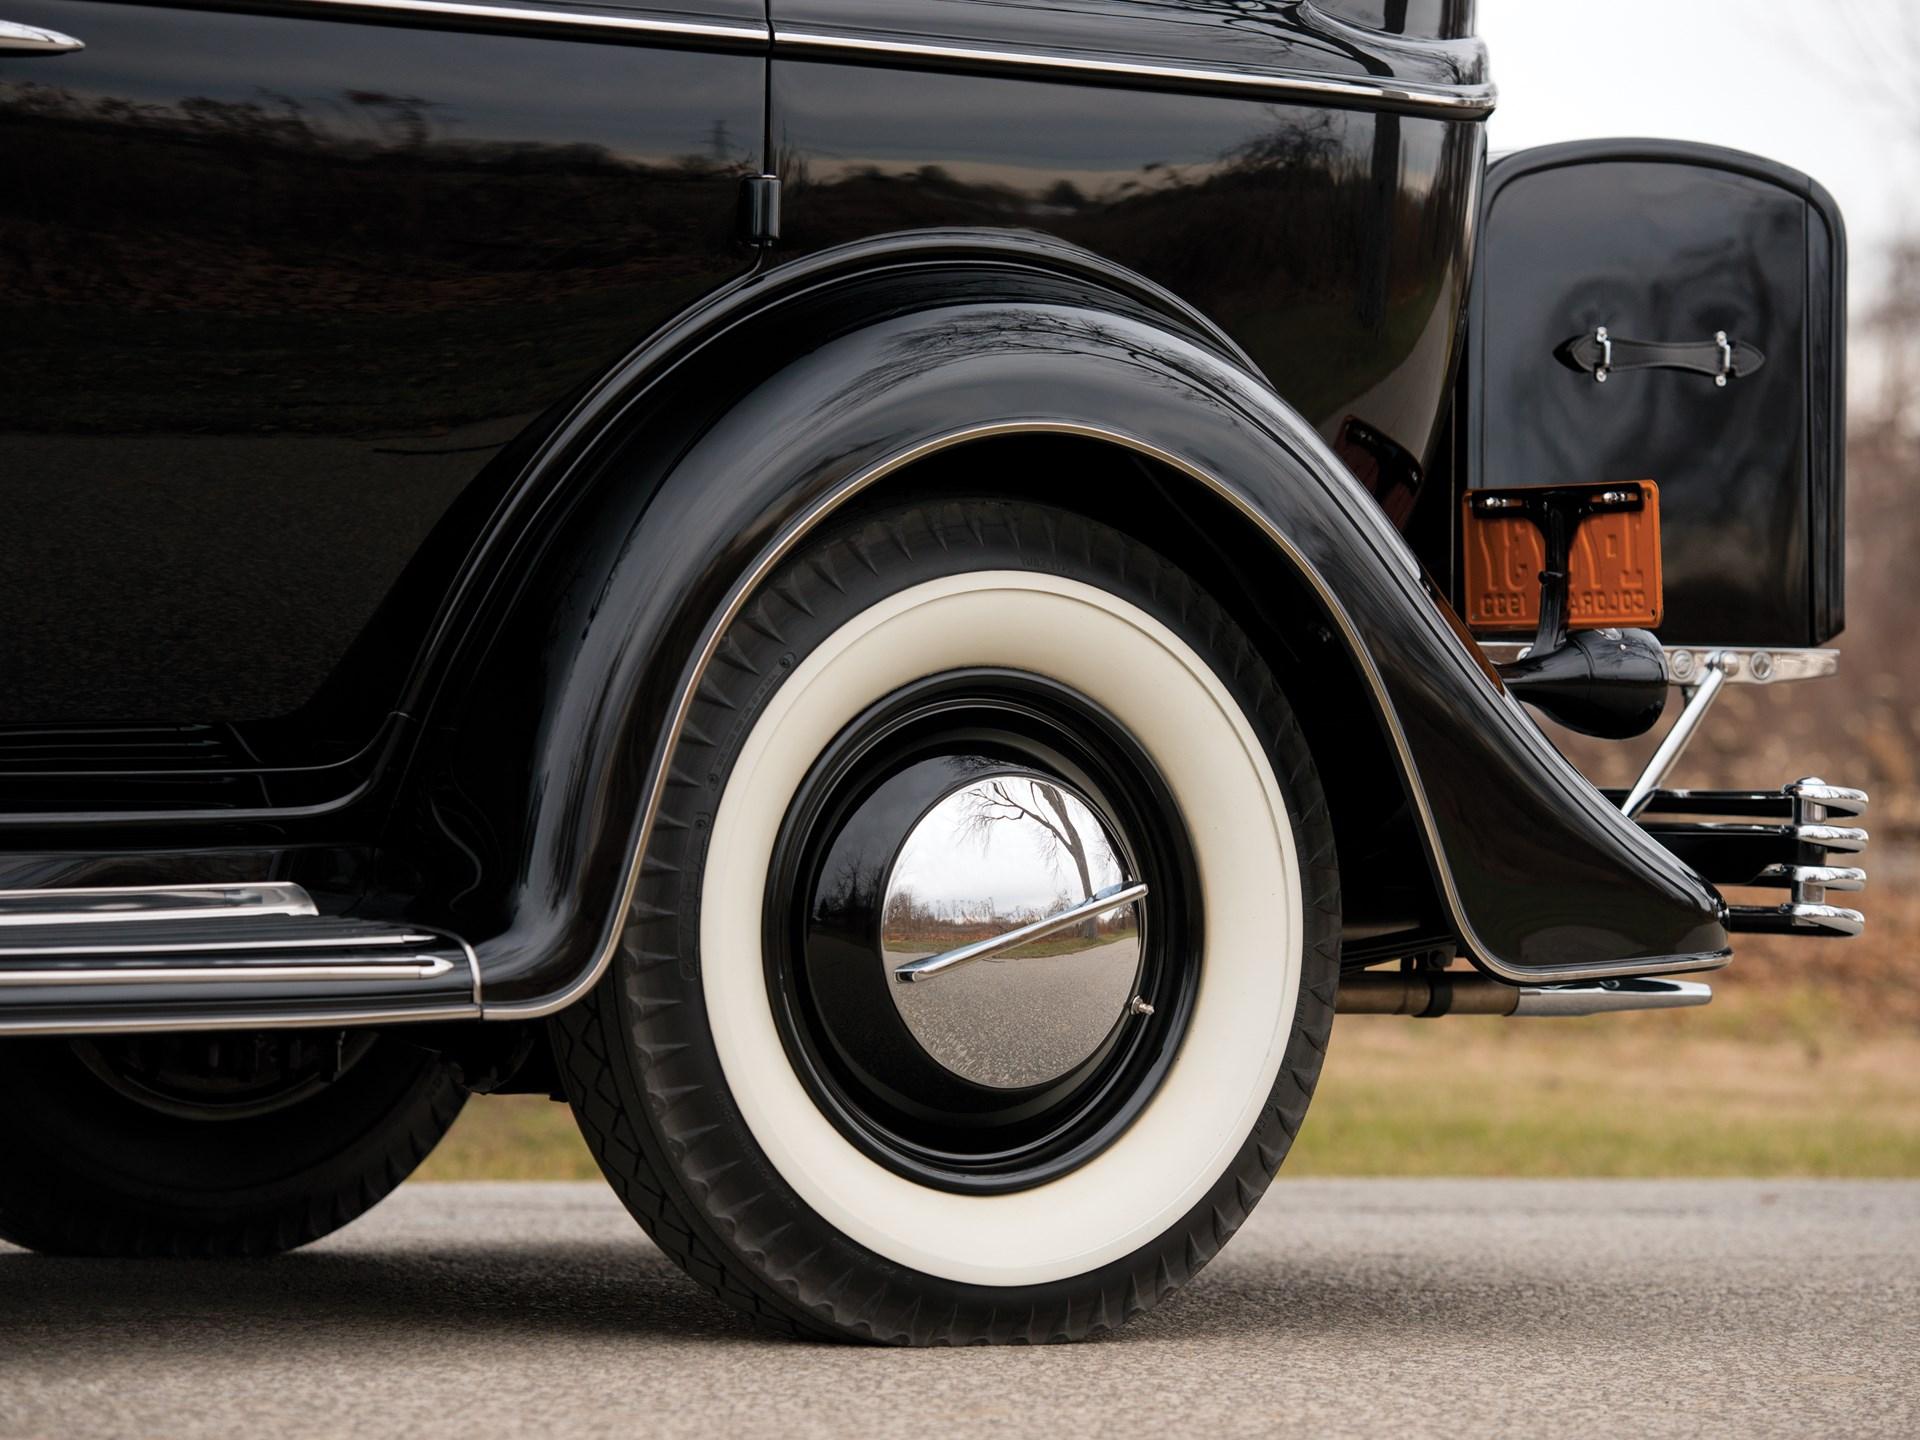 Rm Sothebys 1933 Cadillac V 16 Seven Passenger Sedan By Fleetwood 1963 Wiring Harness